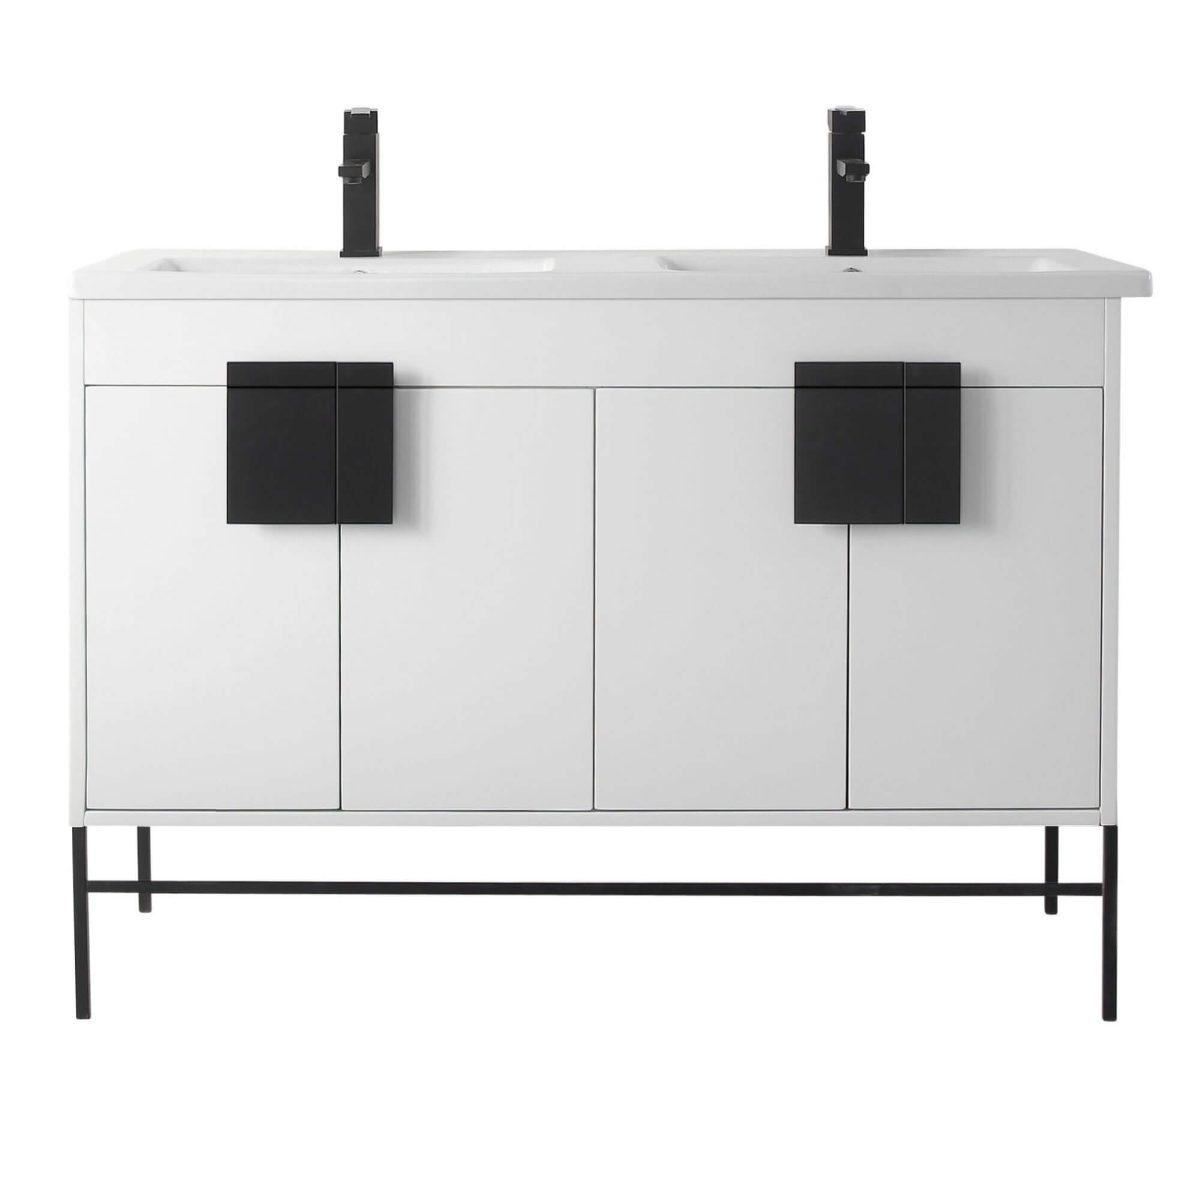 "Shawbridge 48"" Modern Double Bathroom Vanity  White with Black Hardware"